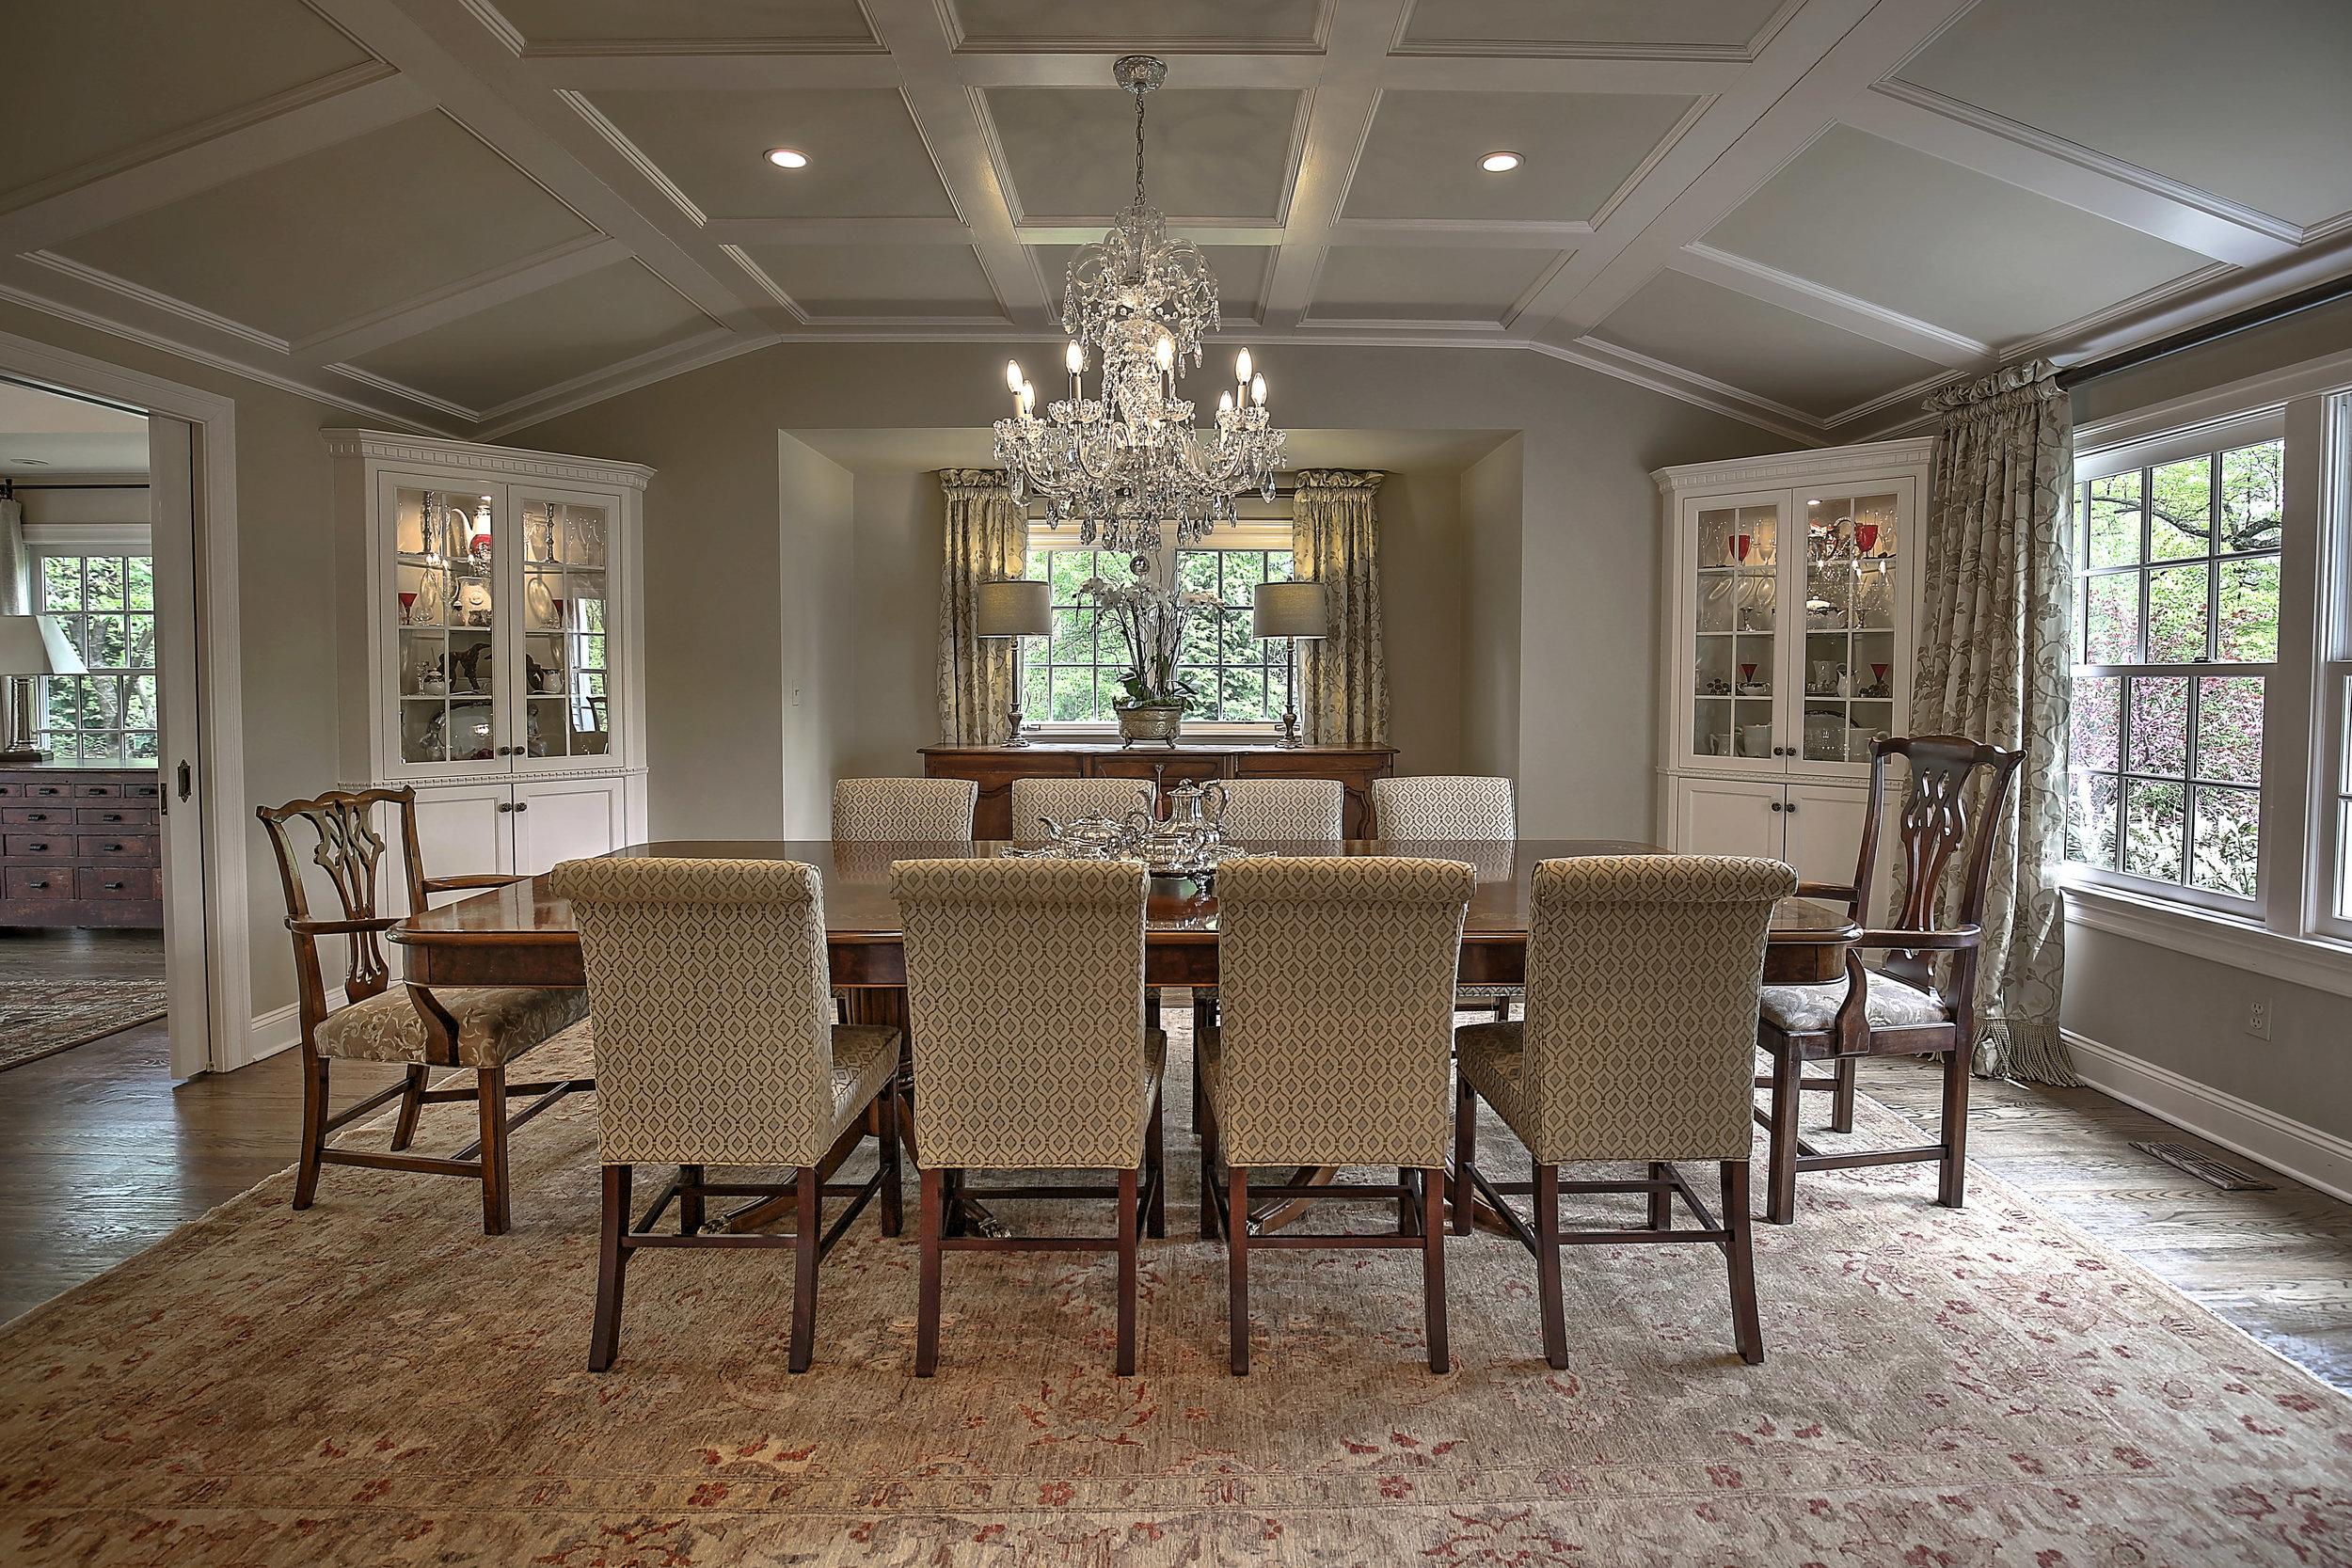 5a Gracious Dining Room 4Z5A1393_4_5_6_7_8_tonemapped copy.jpg